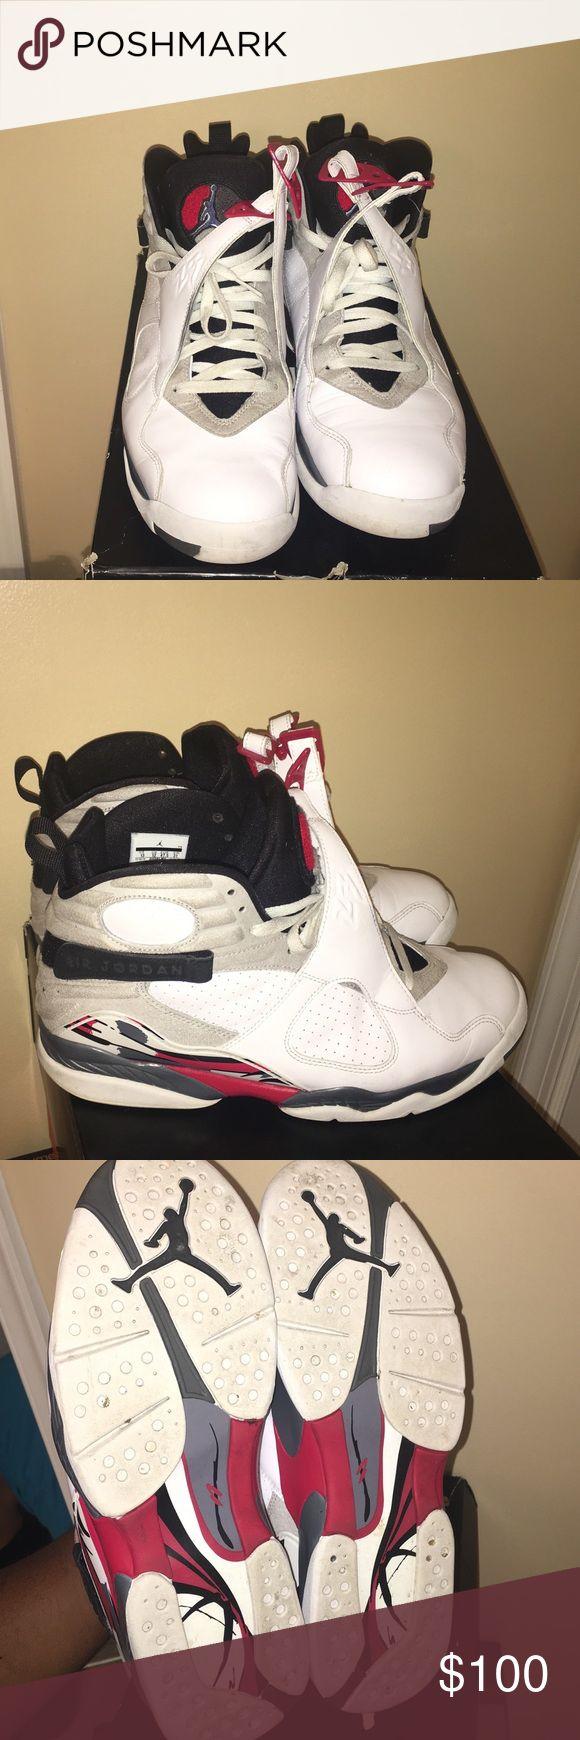 Jordan VIII Retro Men's Jordan VIII Retro Bugs Bunny, 2014 release. Great condition with original box. Jordan Shoes Sneakers